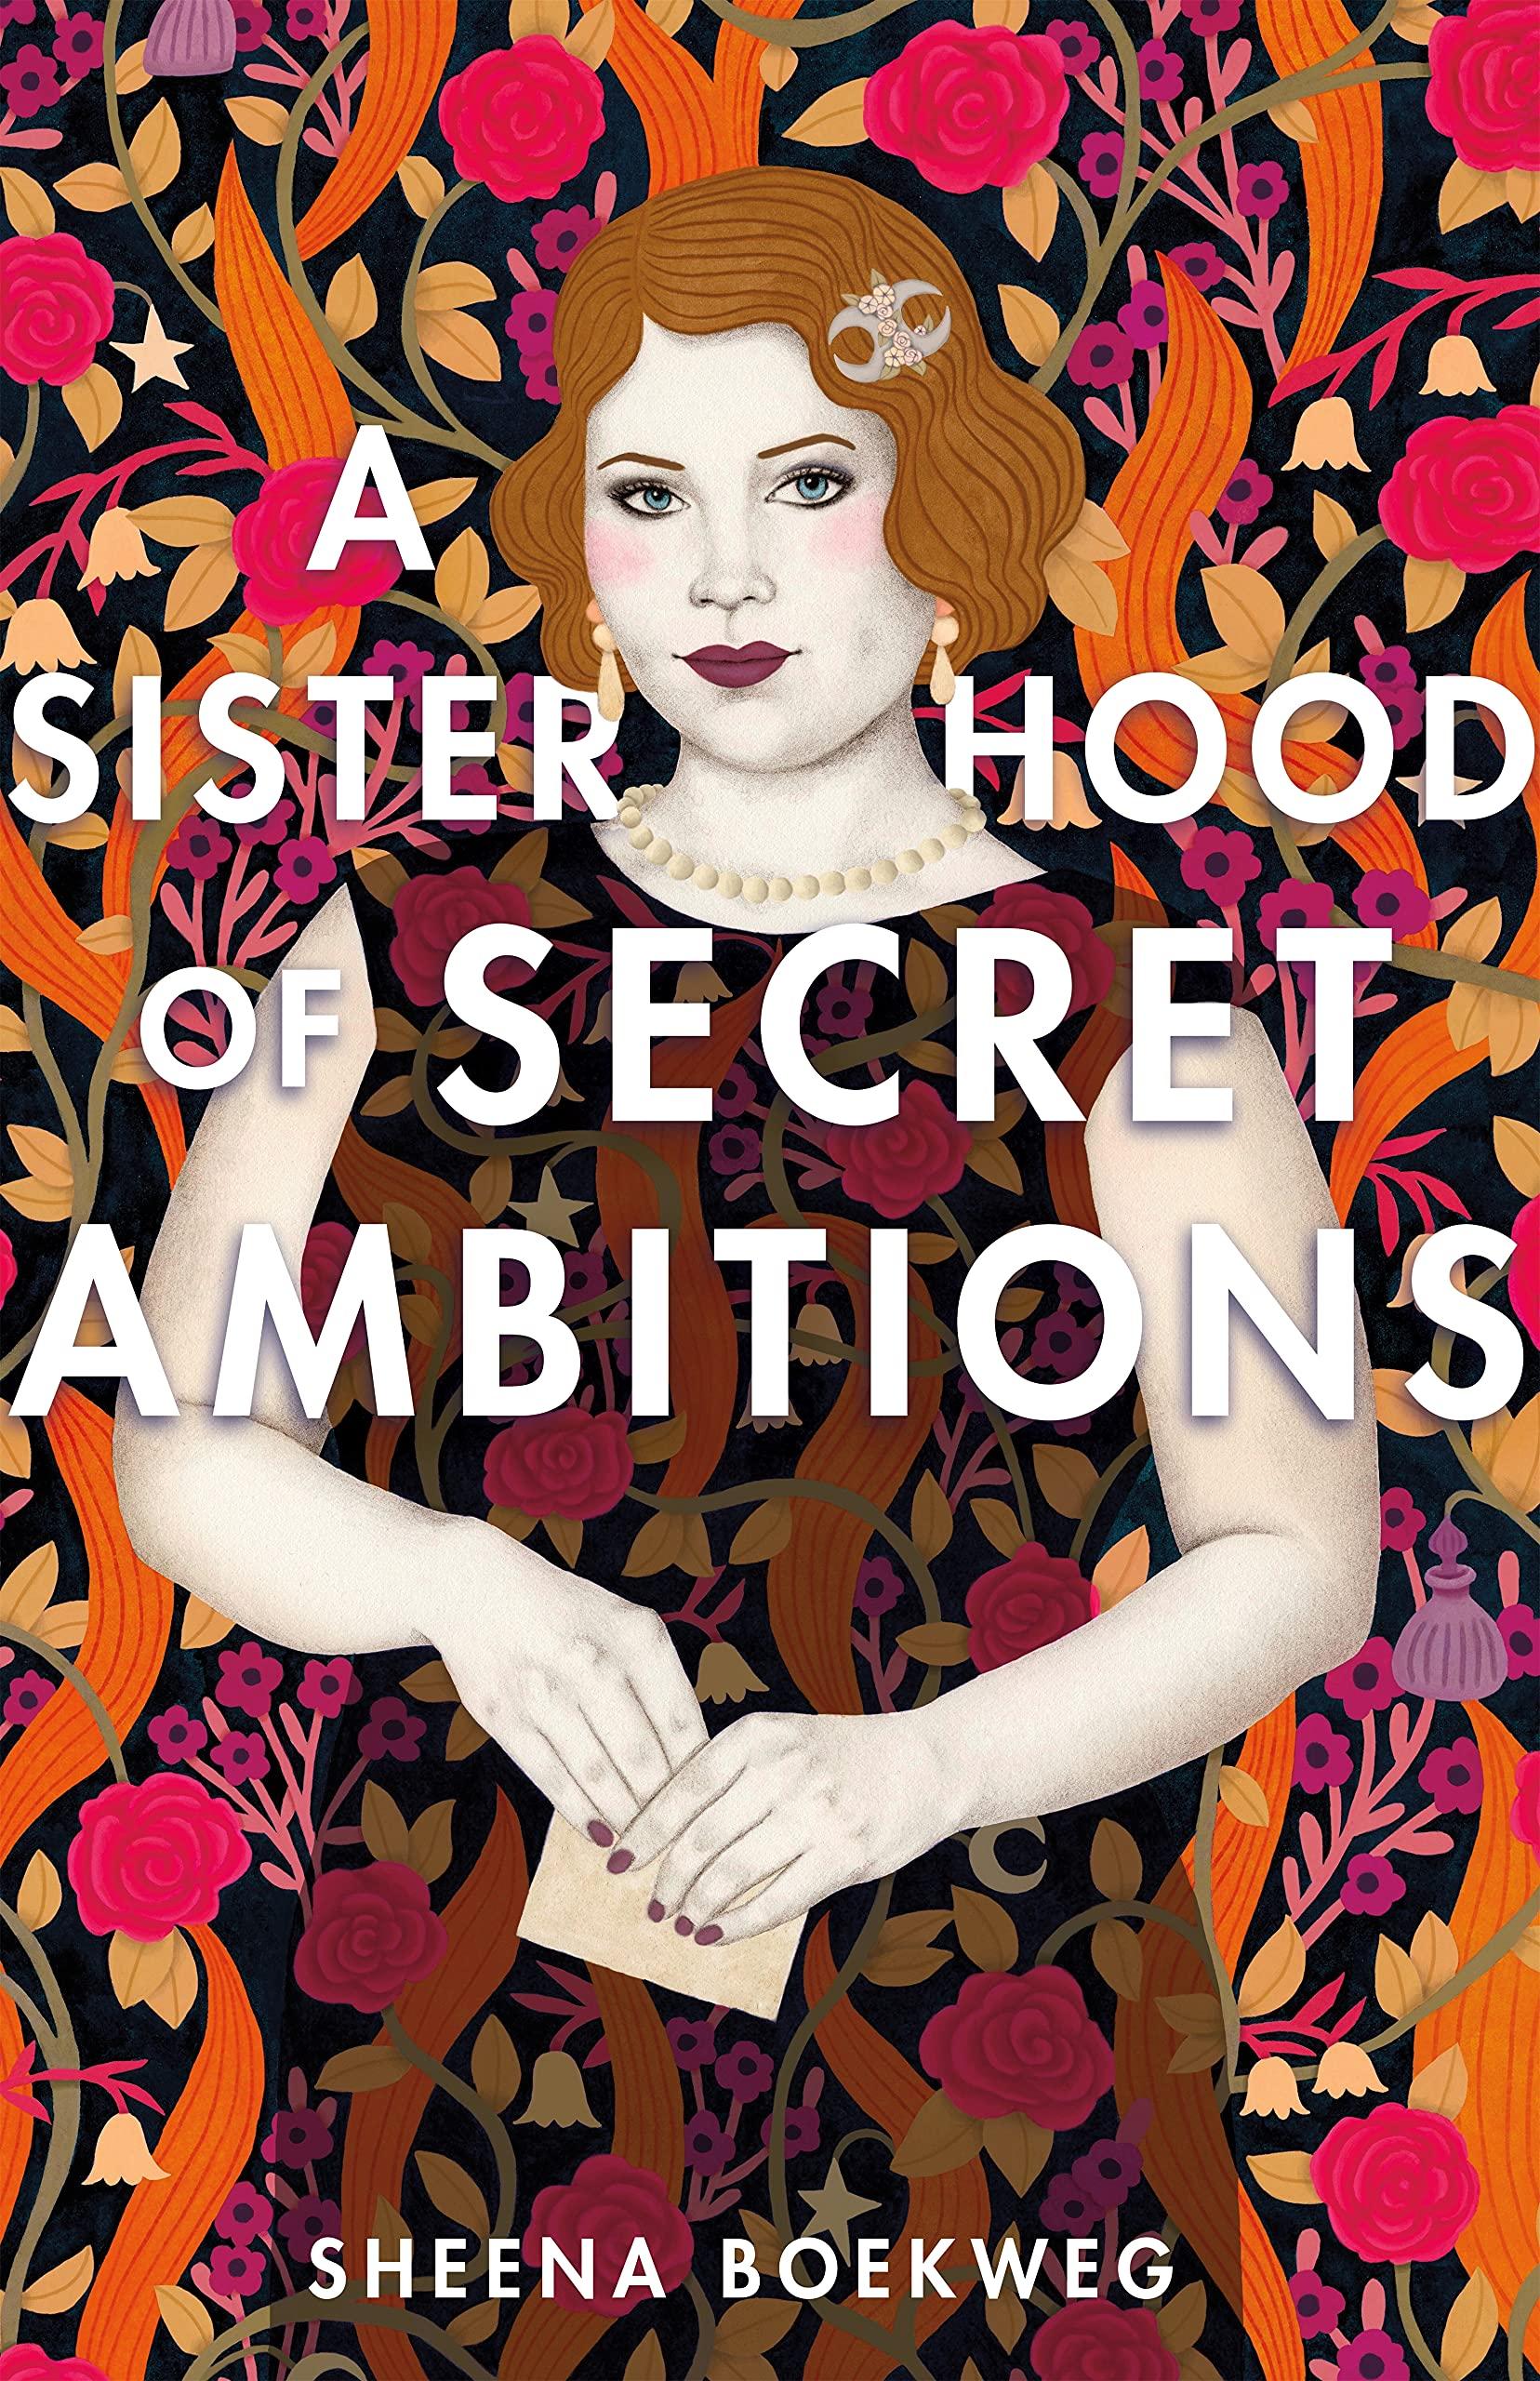 Amazon.com: A Sisterhood of Secret Ambitions: 9781250770981: Boekweg,  Sheena: Books